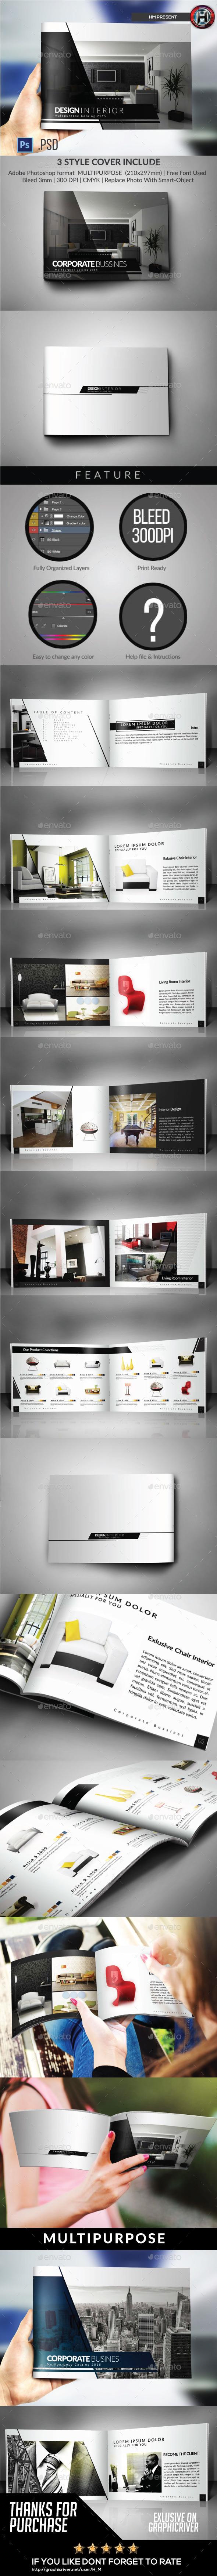 Multipurpose Catalogs / Brochure / Portfolio Template - Brochures Print Templates